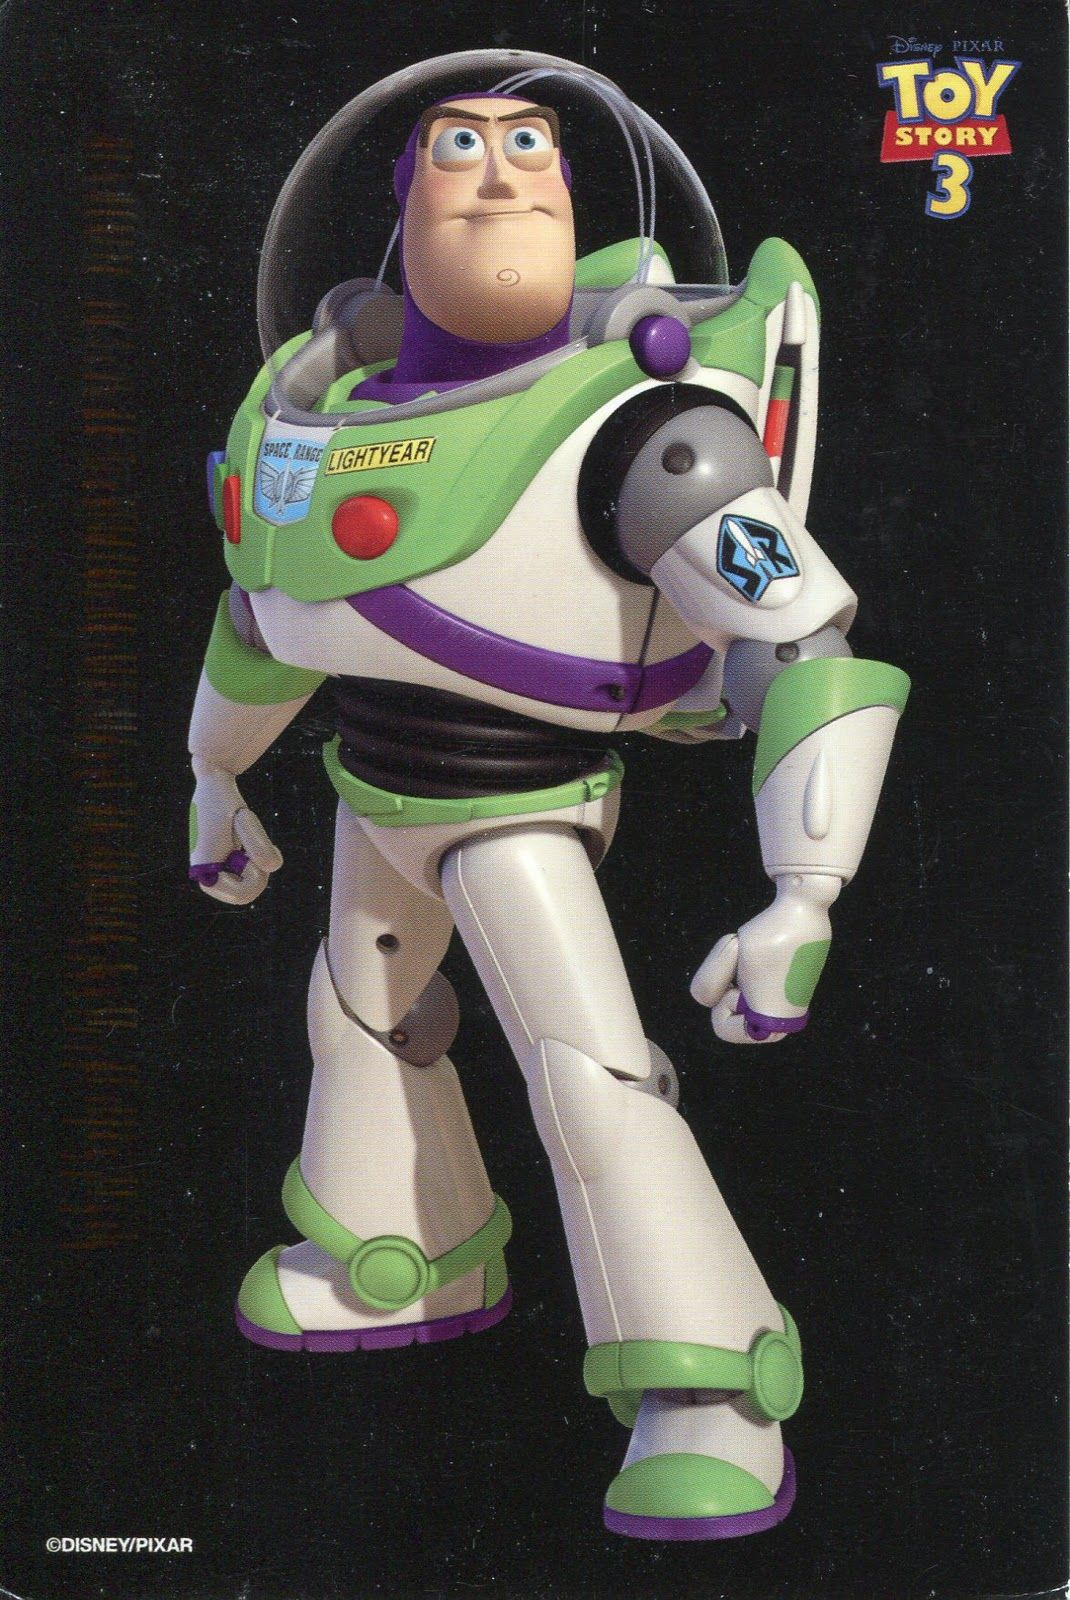 buzz lightyear - Google Search | Toy Story | Pinterest ...